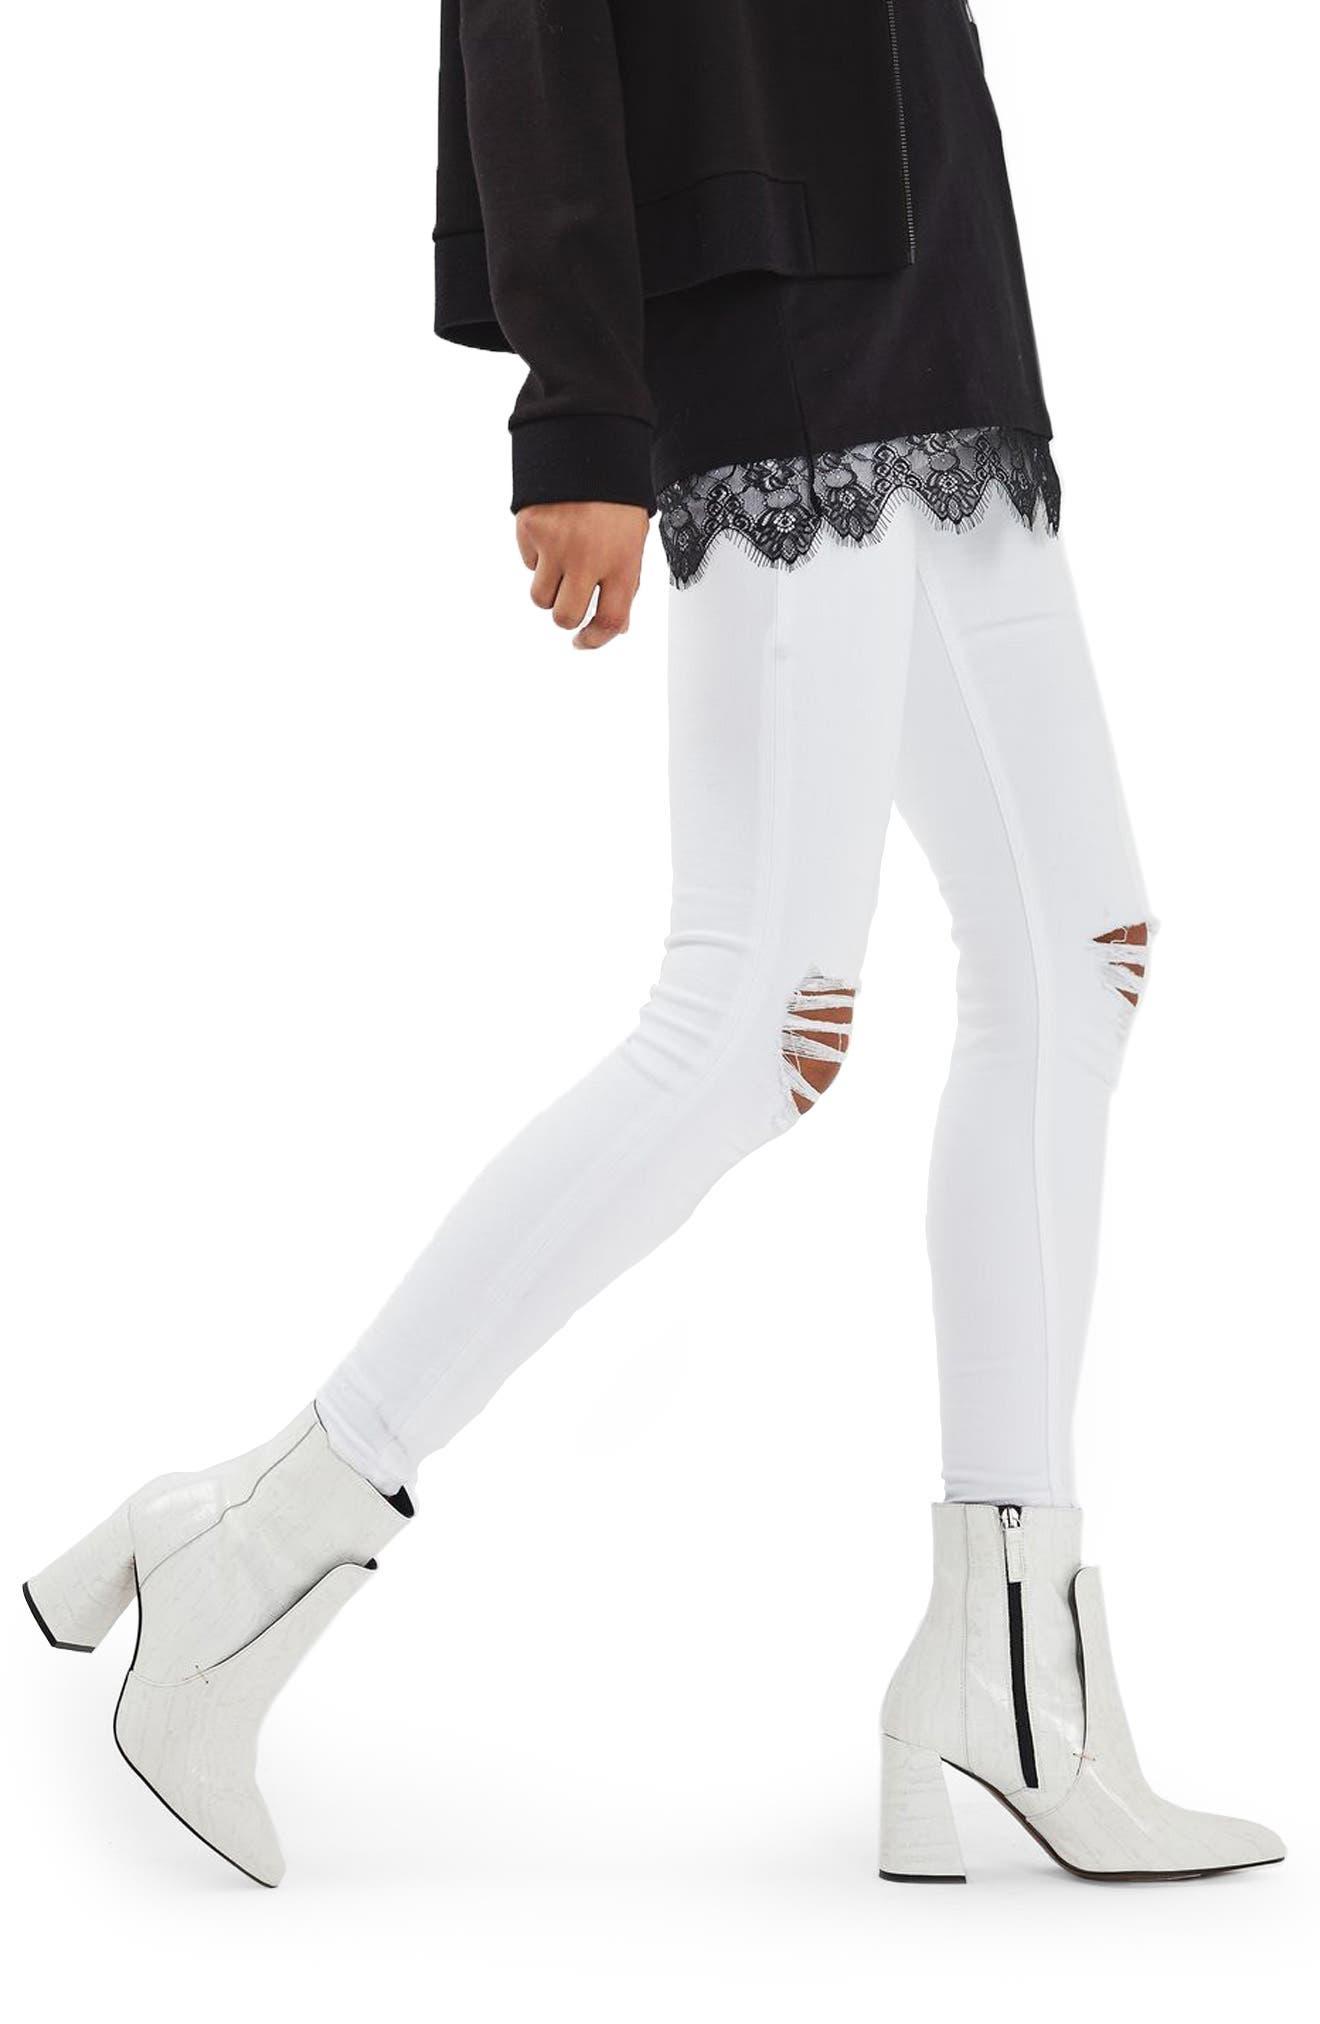 Jamie Ripped Skinny Jeans,                             Alternate thumbnail 4, color,                             White